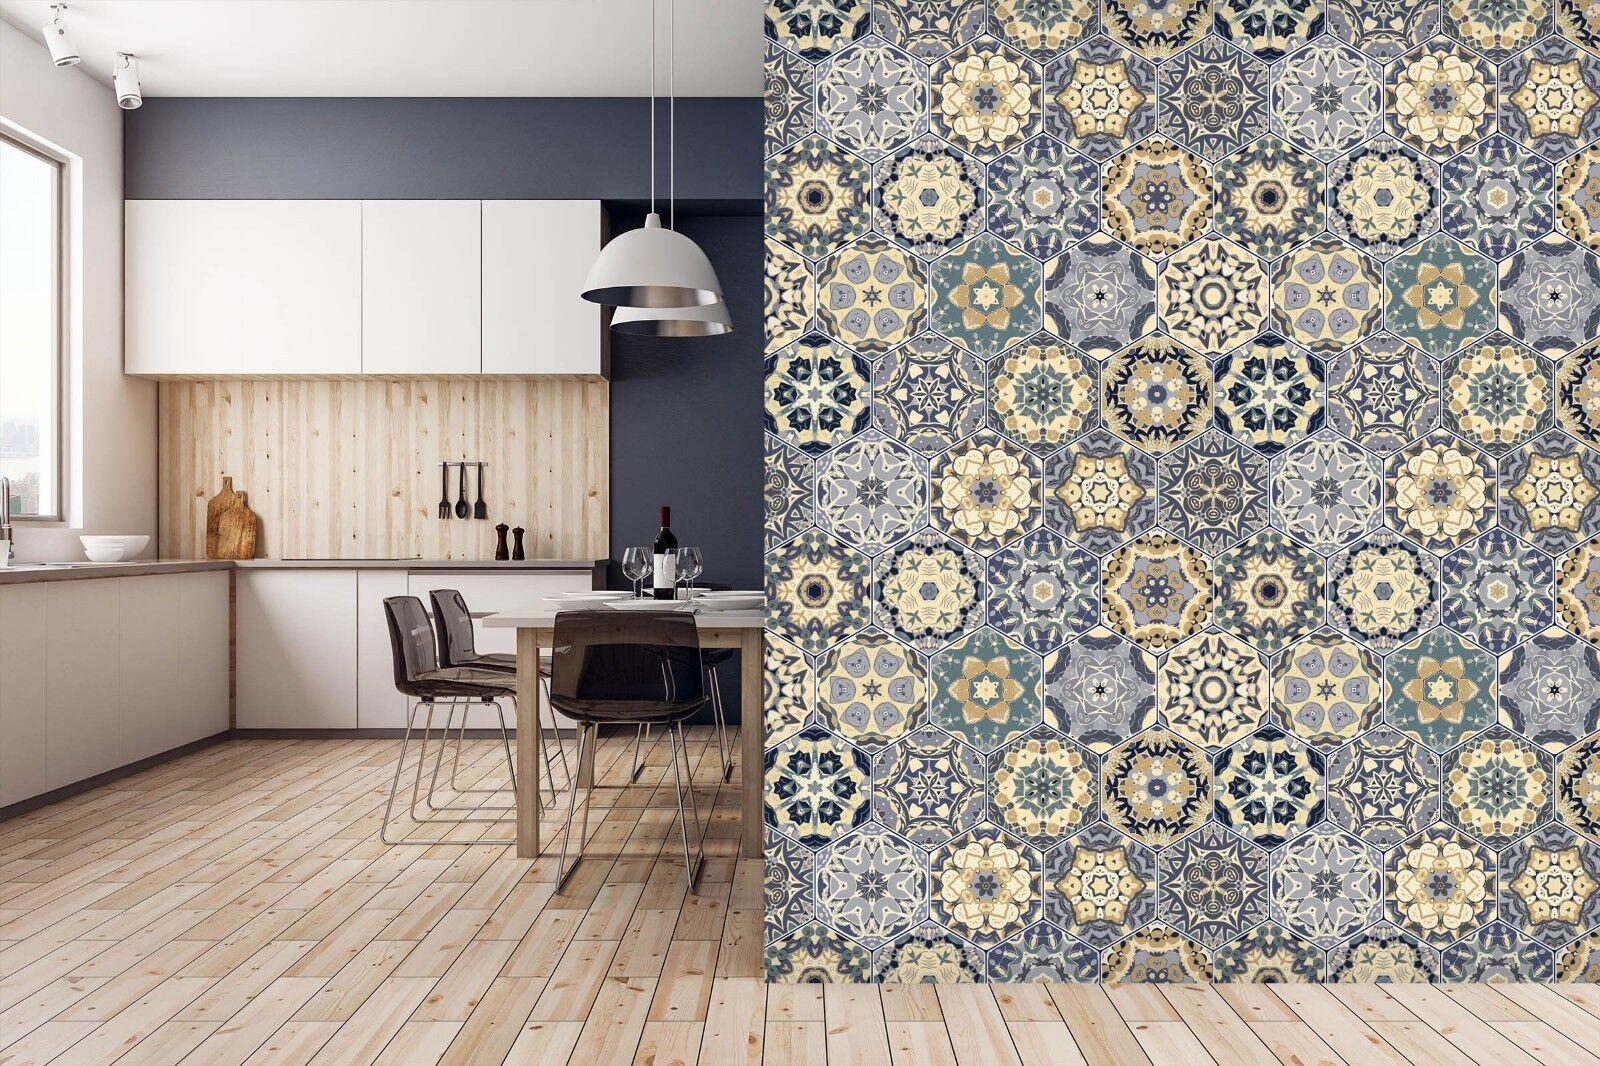 3D Spitze Muster 8435 Textur Fliesen Marmor Tapeten Abziehbild Tapete Wandbild